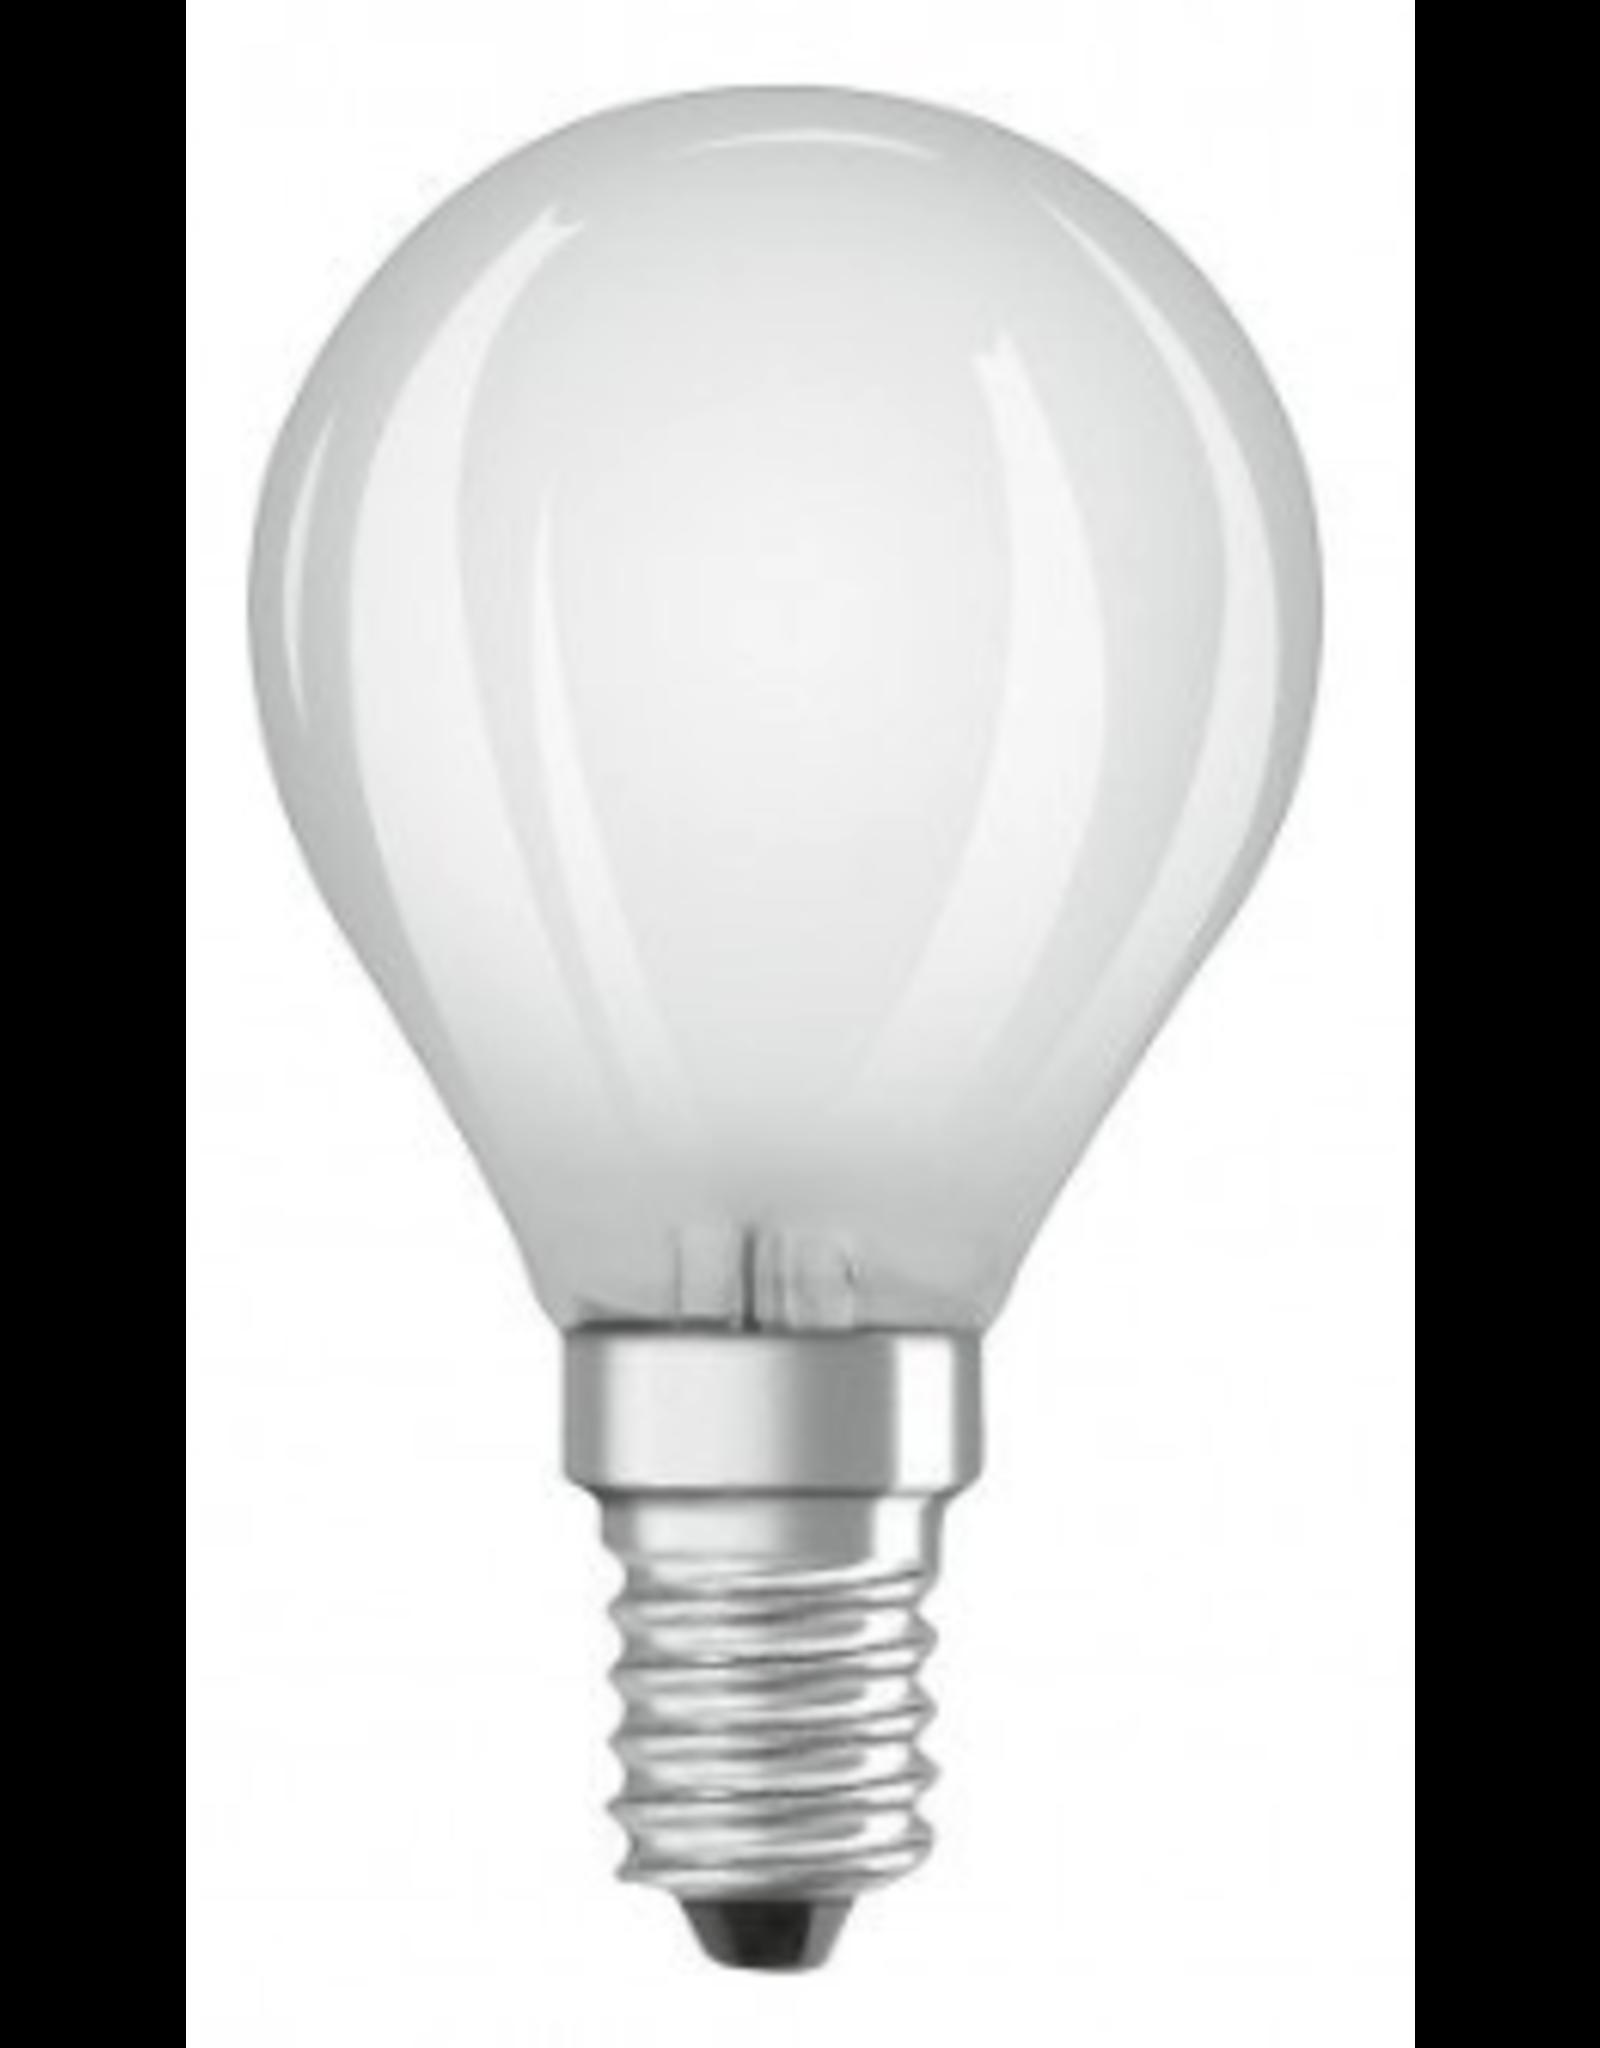 Led Bolvorm - kleine fitting - niet dimbaar - warm wit - 25 -> 3 watt